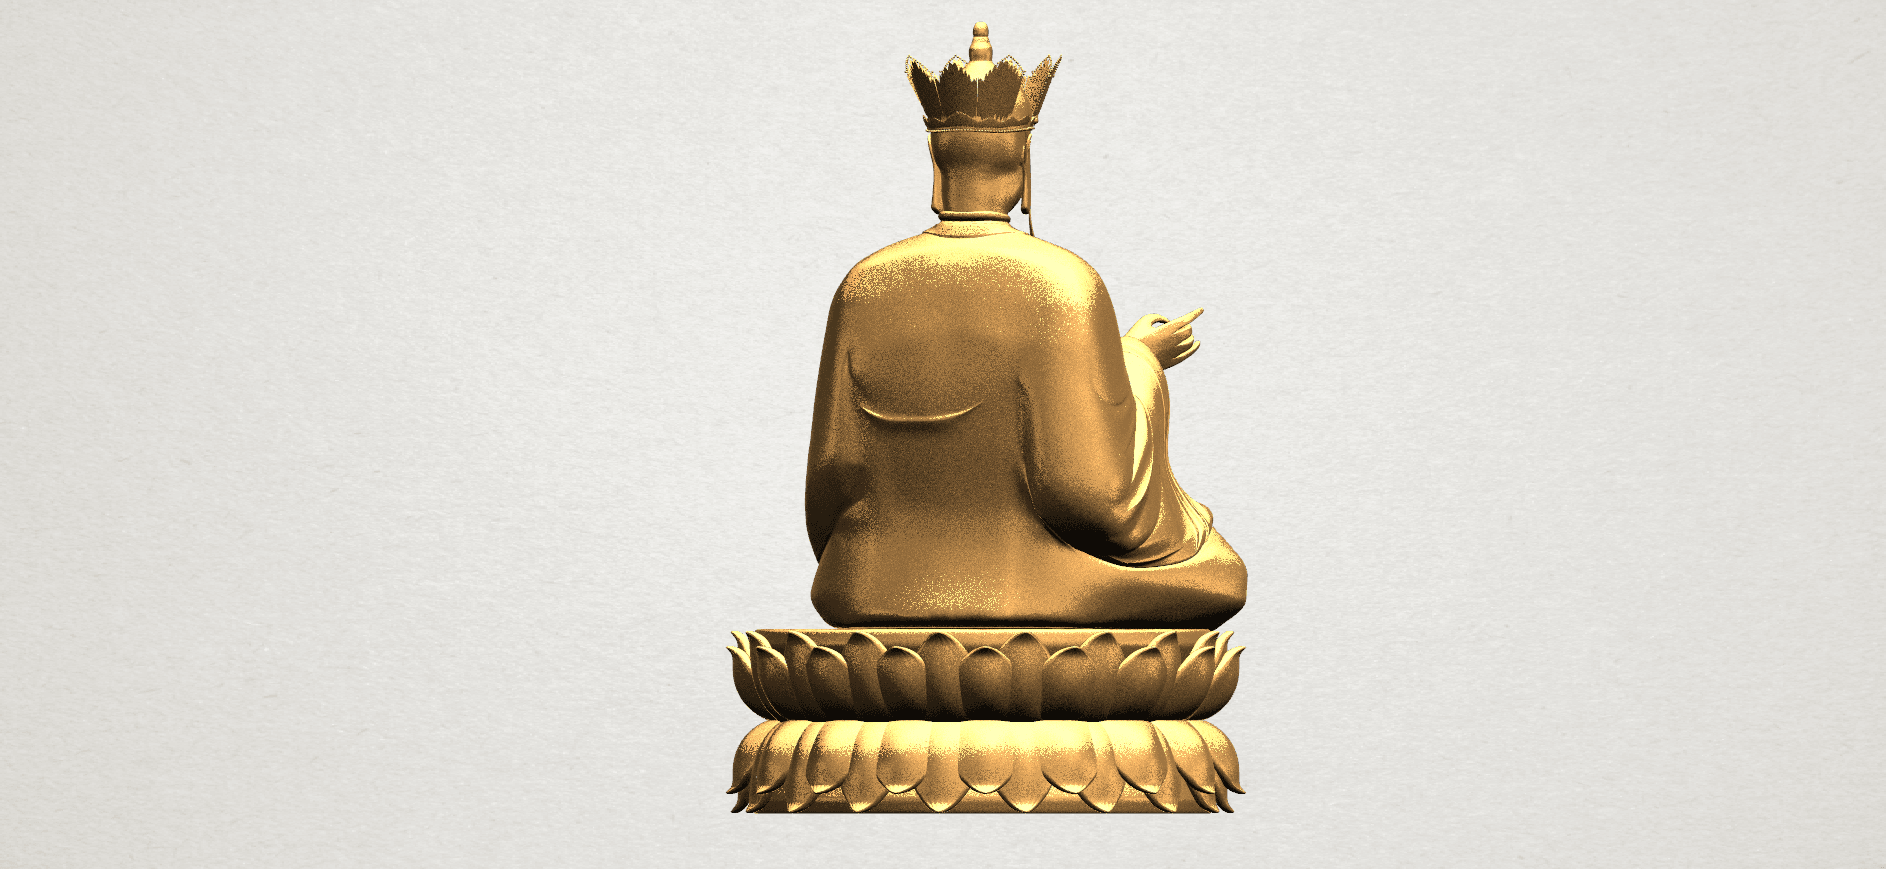 Tang Monk Xuan Zang A05.png Télécharger fichier STL gratuit Tang Monk Xuan Zang Zang • Plan à imprimer en 3D, GeorgesNikkei